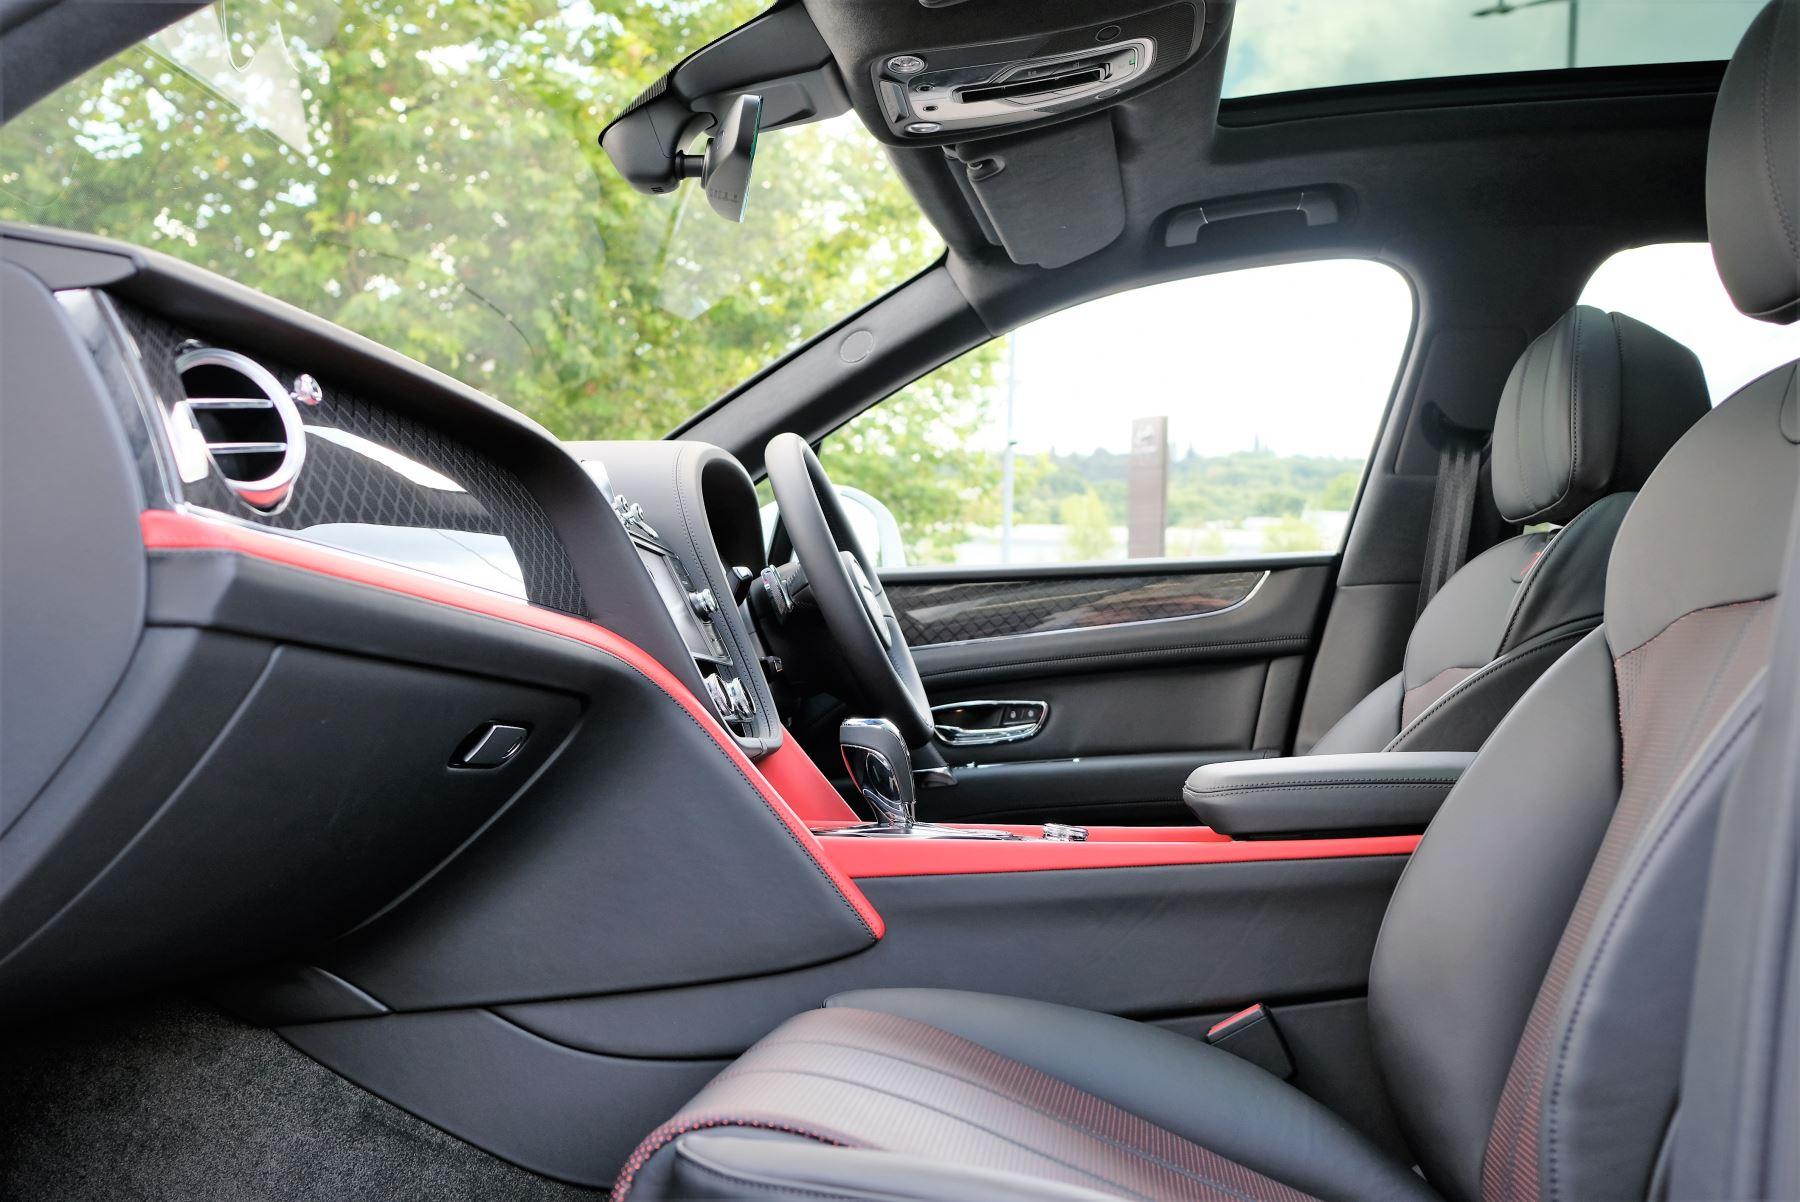 Bentley Bentayga V8 4.0 Design Series 5dr image 24